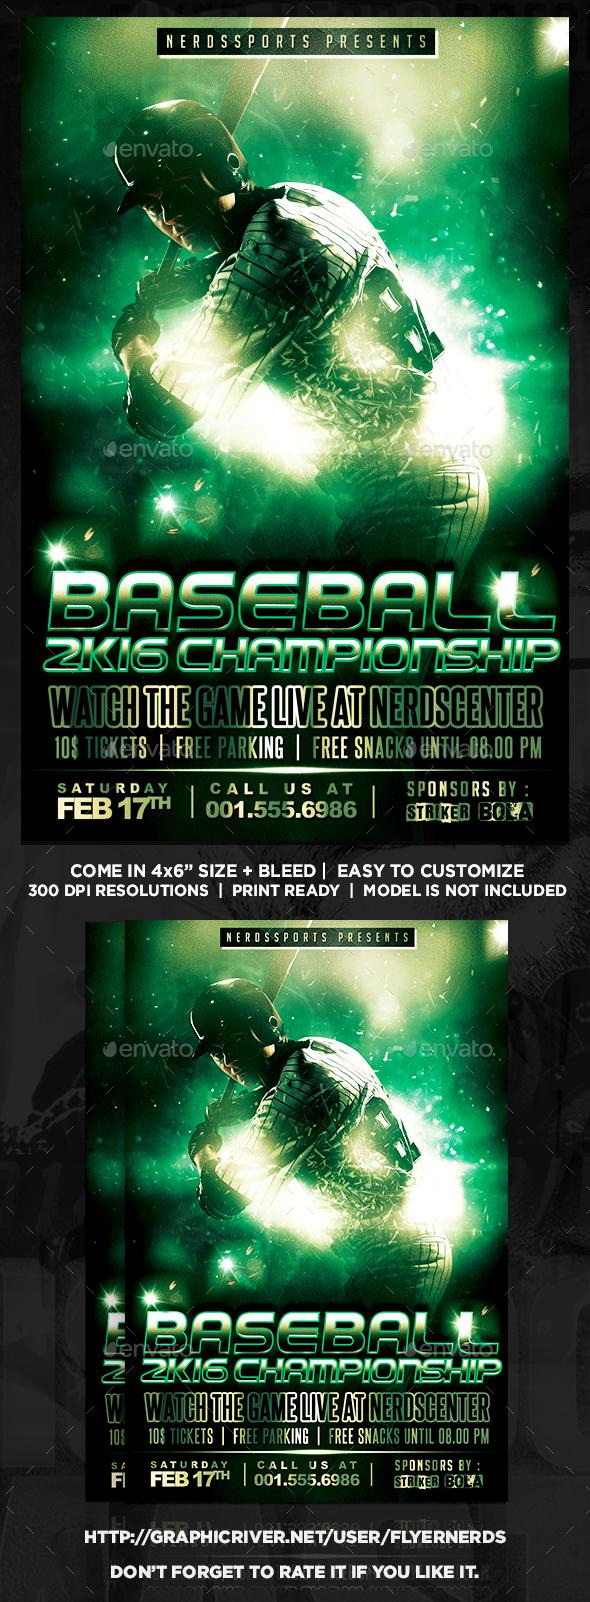 Baseball 2K16 Championships Sports Flyer - Sports Events